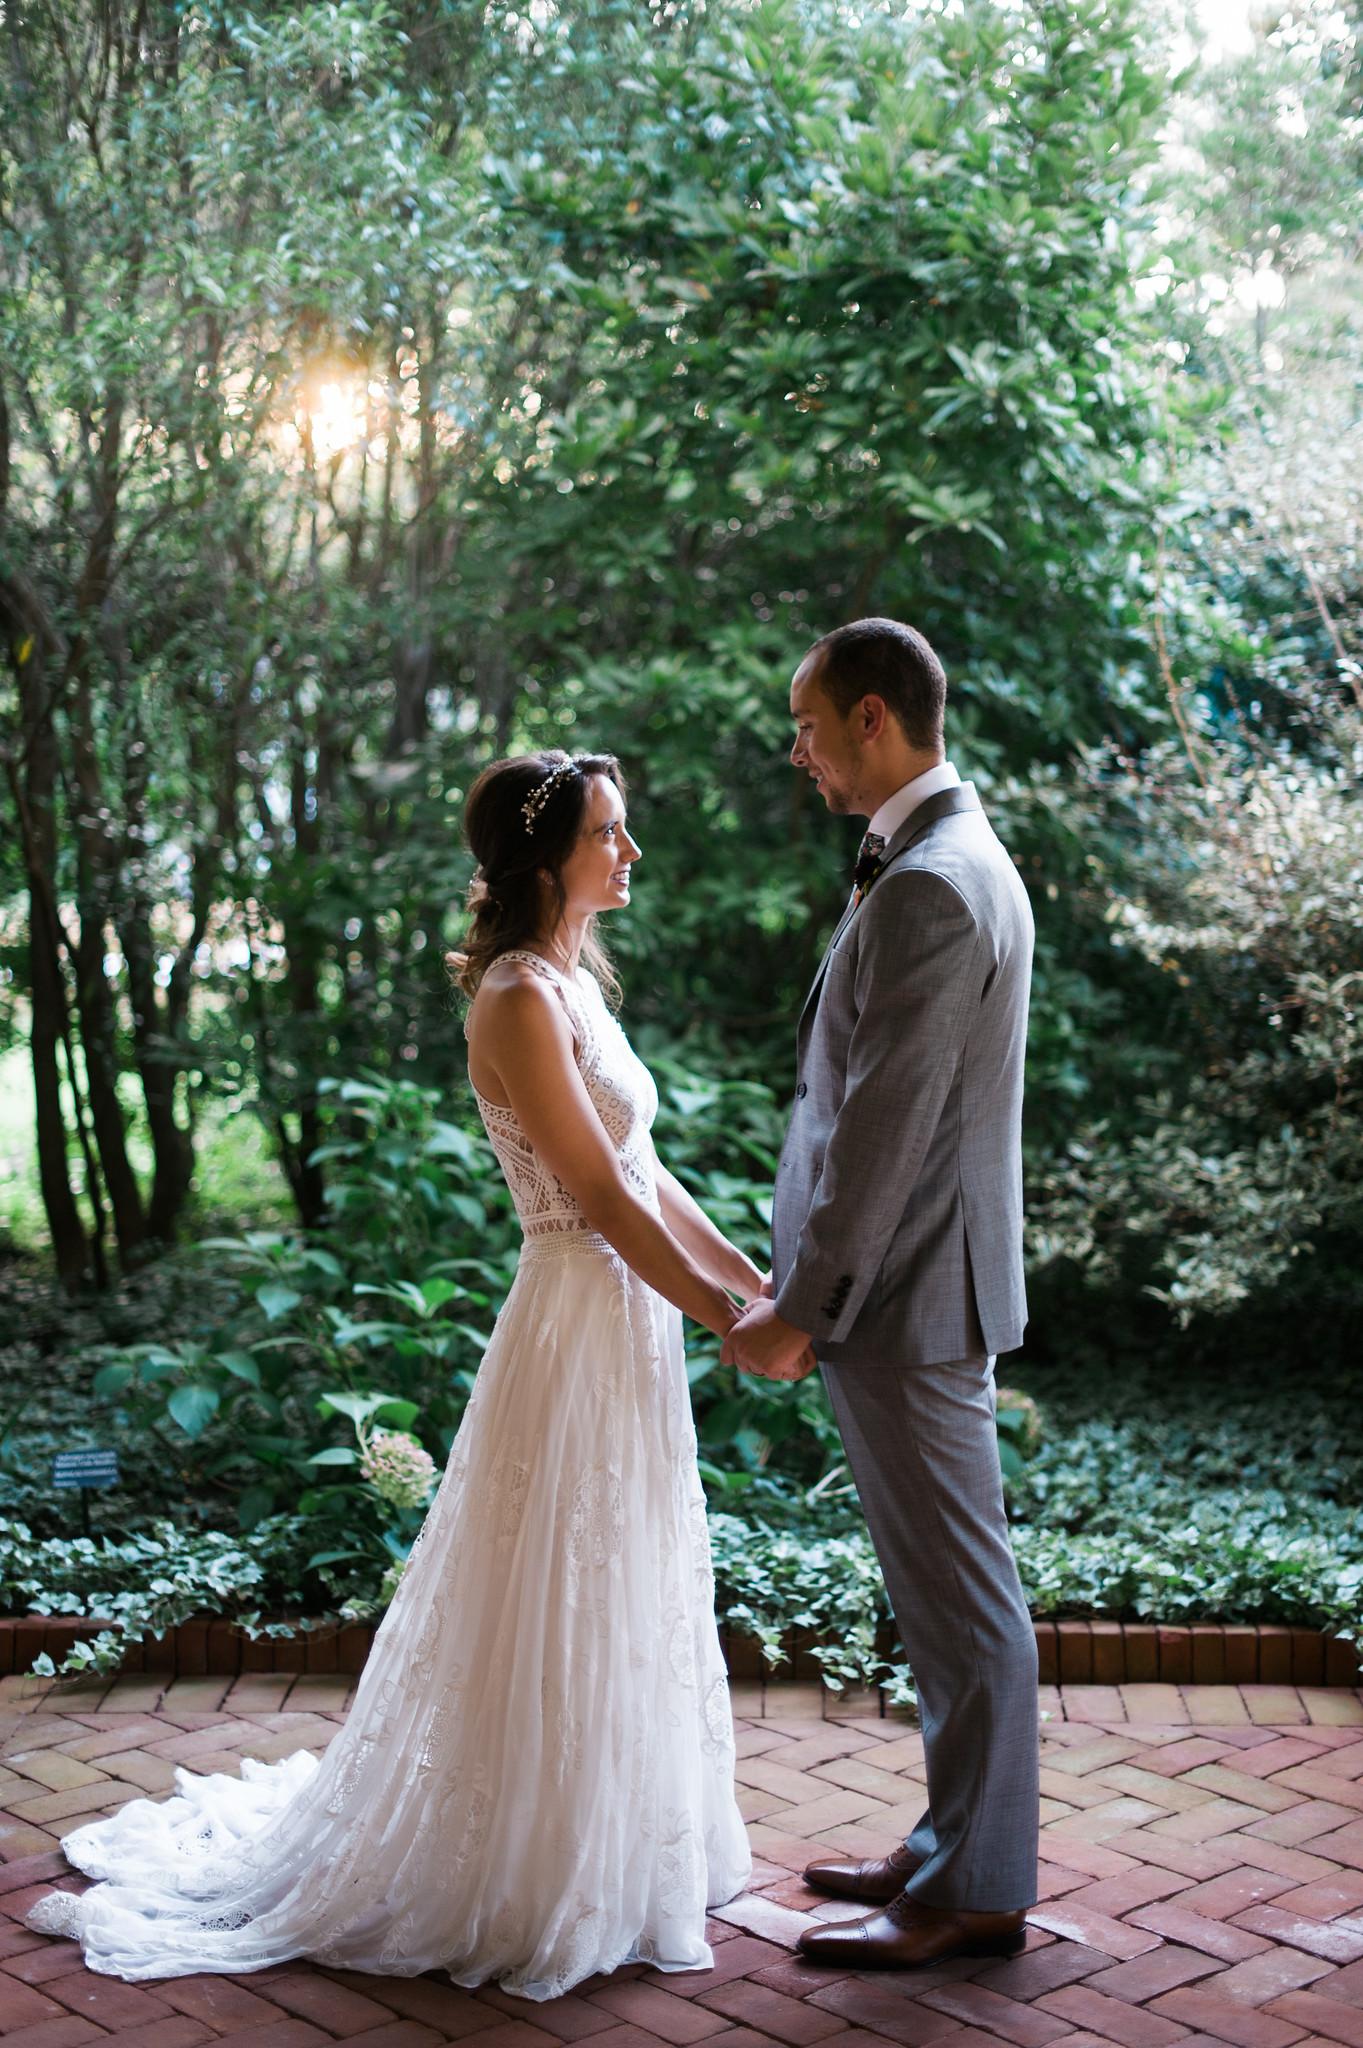 thomas-wedding-321-X4.jpg